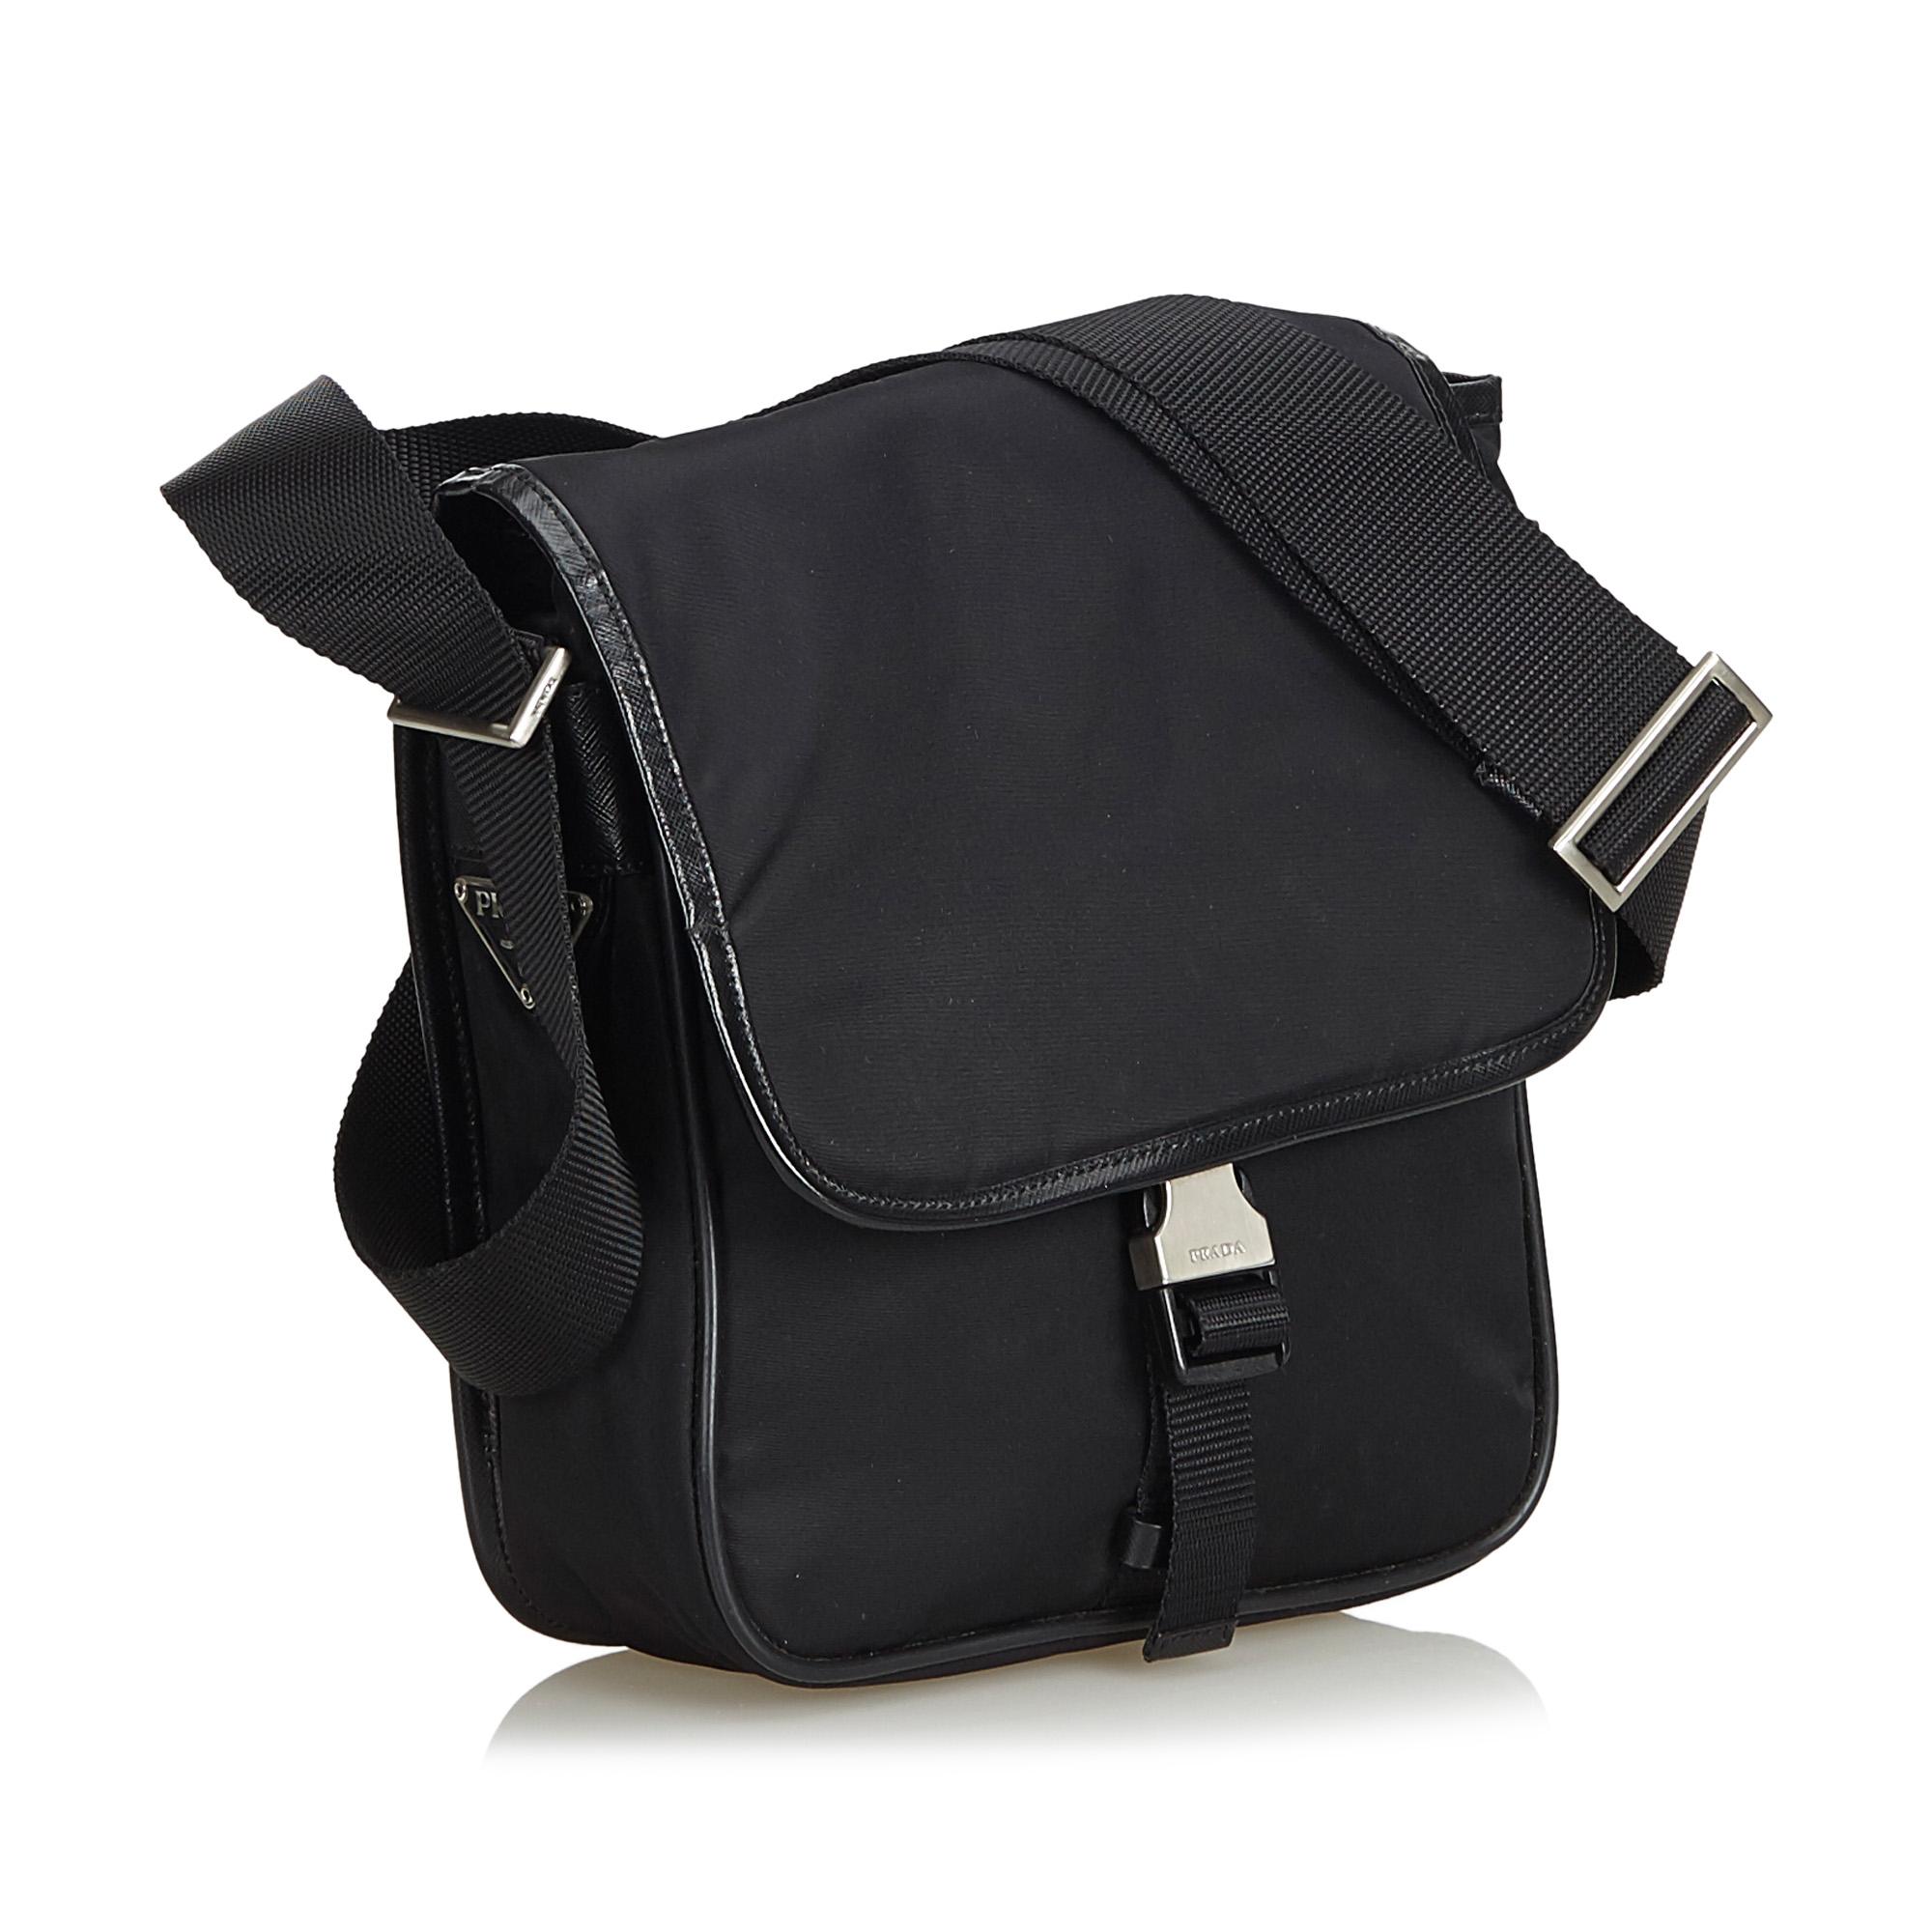 98598ab005d1 Vintage Prada Black Nylon Fabric Crossbody Bag Italy 2 2 of 12 ...